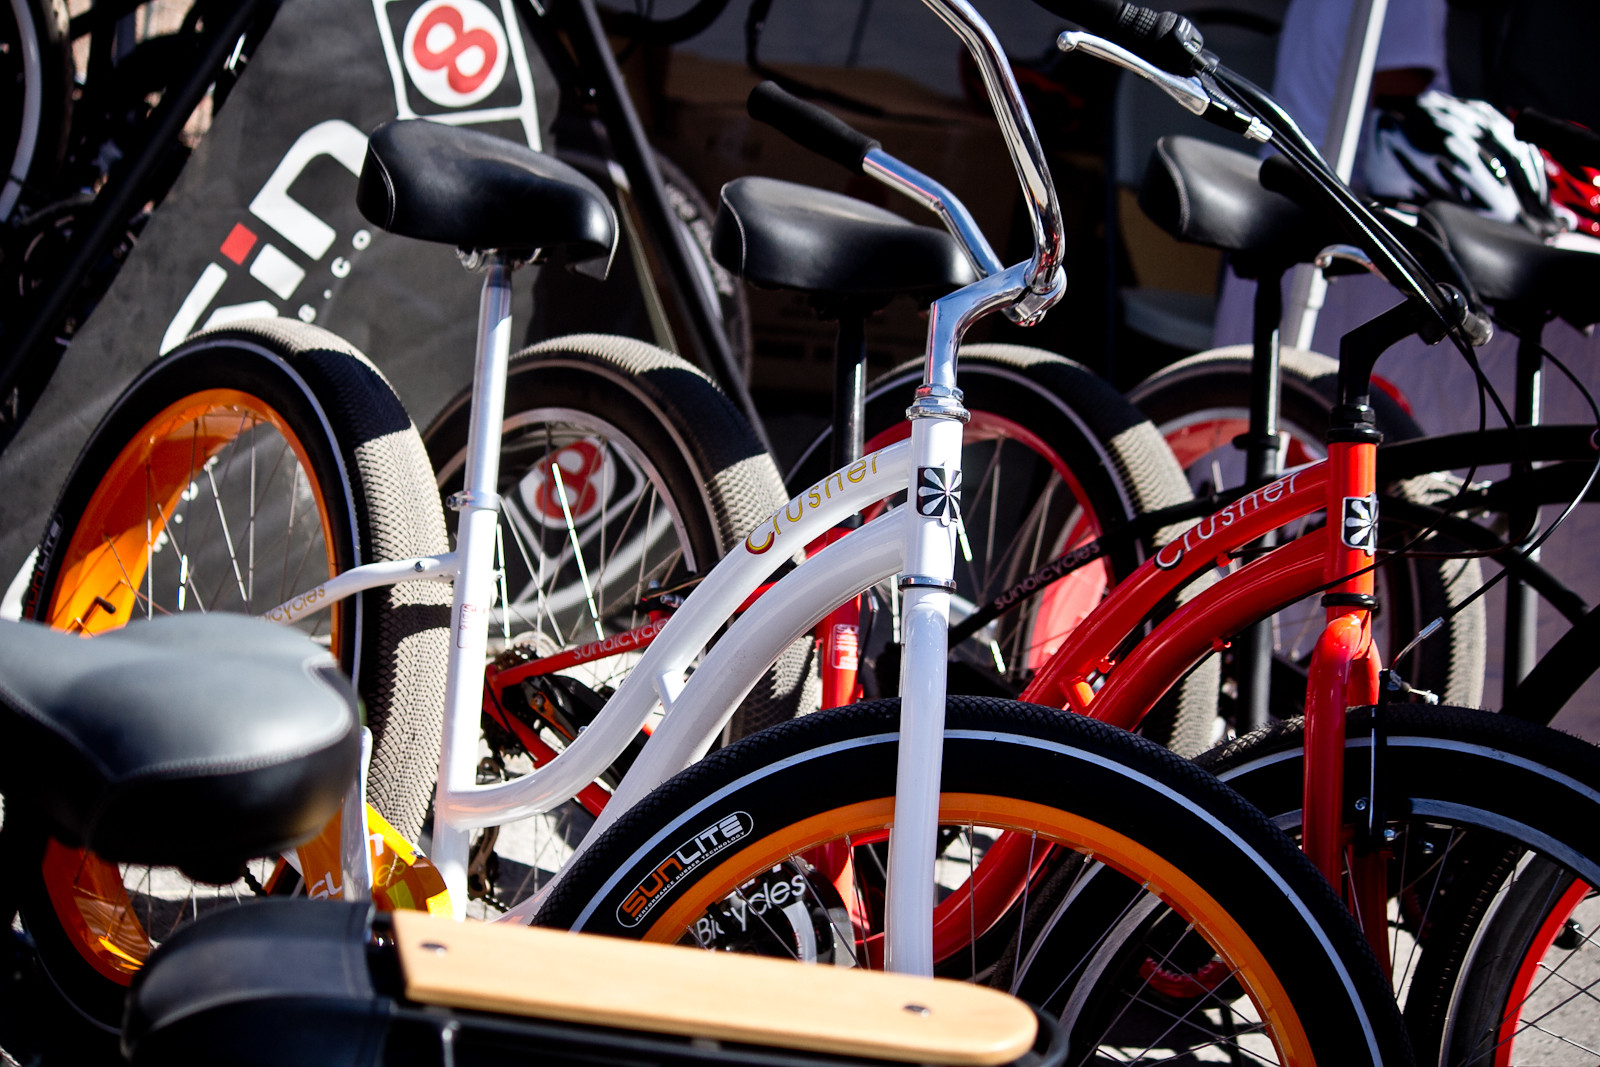 Fat Bike Cruisers - INTERBIKE: Part 1 - Outdoor Demo Rad Bits & Randoms - Mountain Biking Pictures - Vital MTB